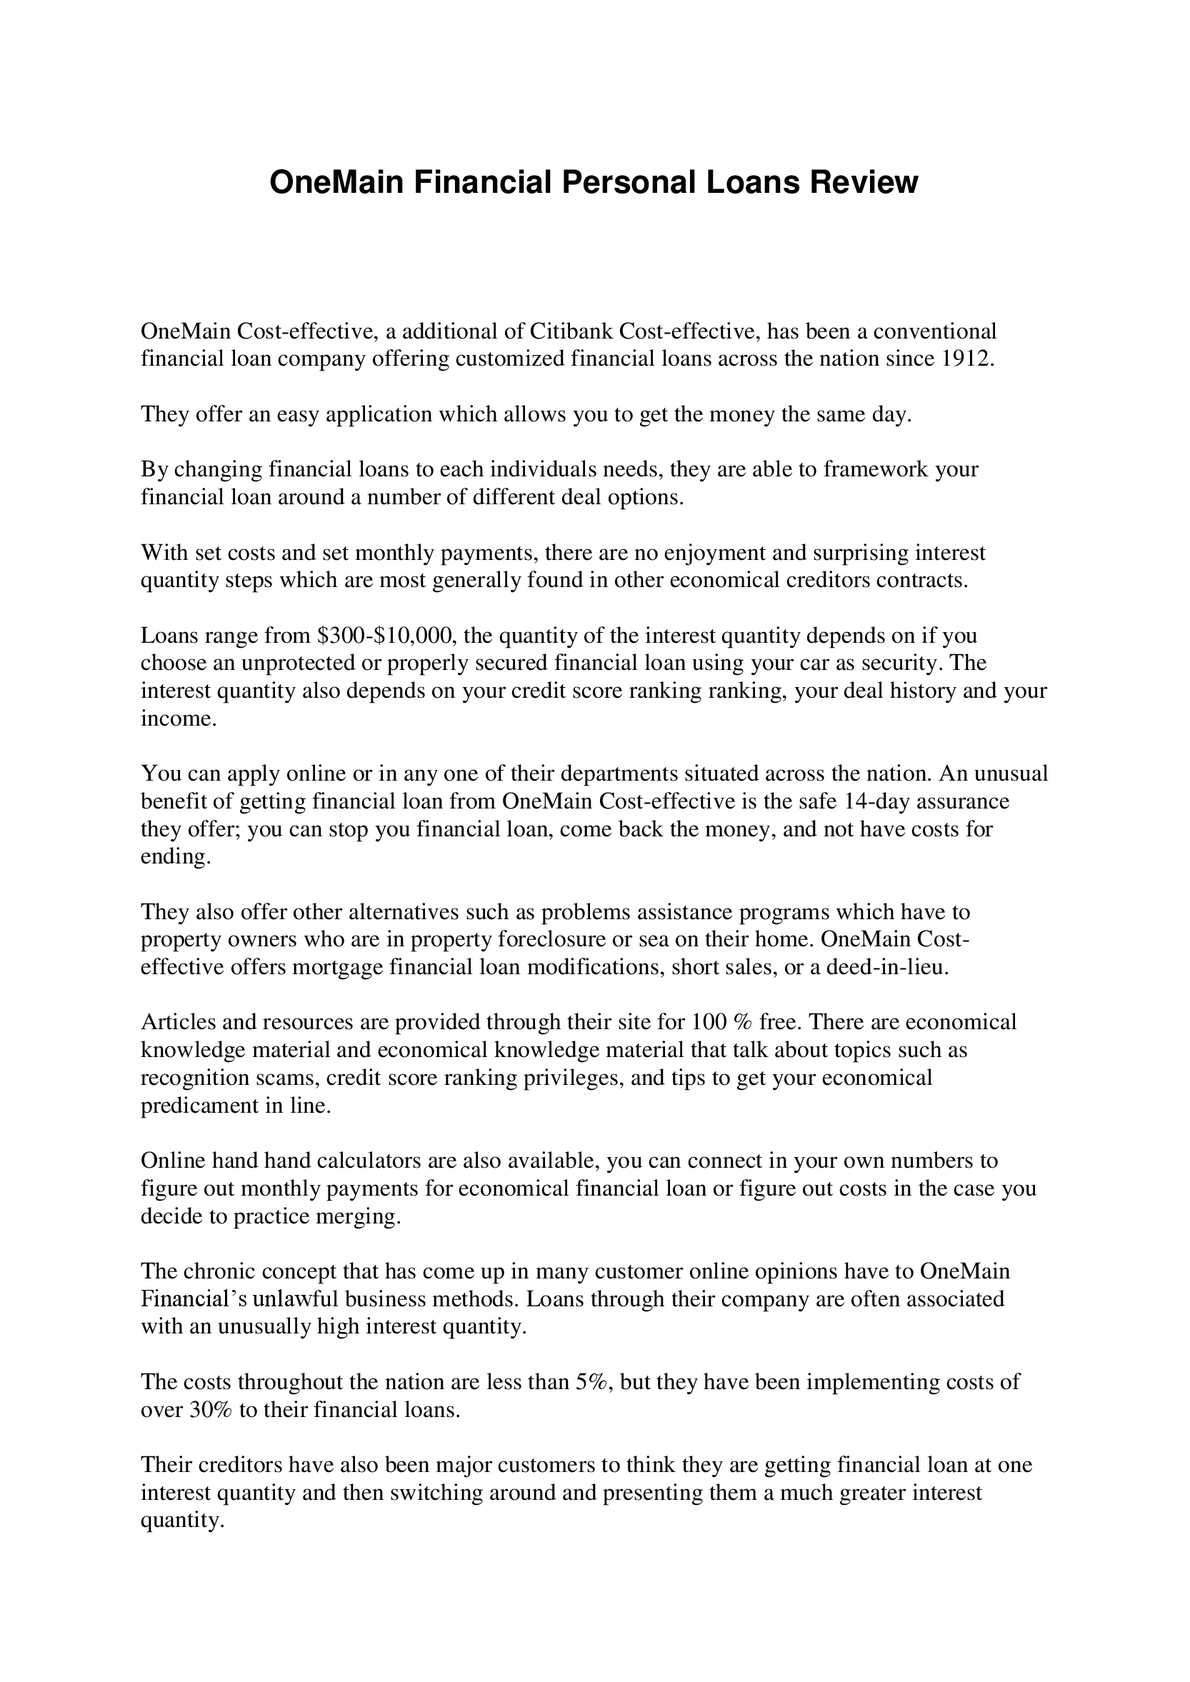 Calameo Onemain Financial Personal Loans Review